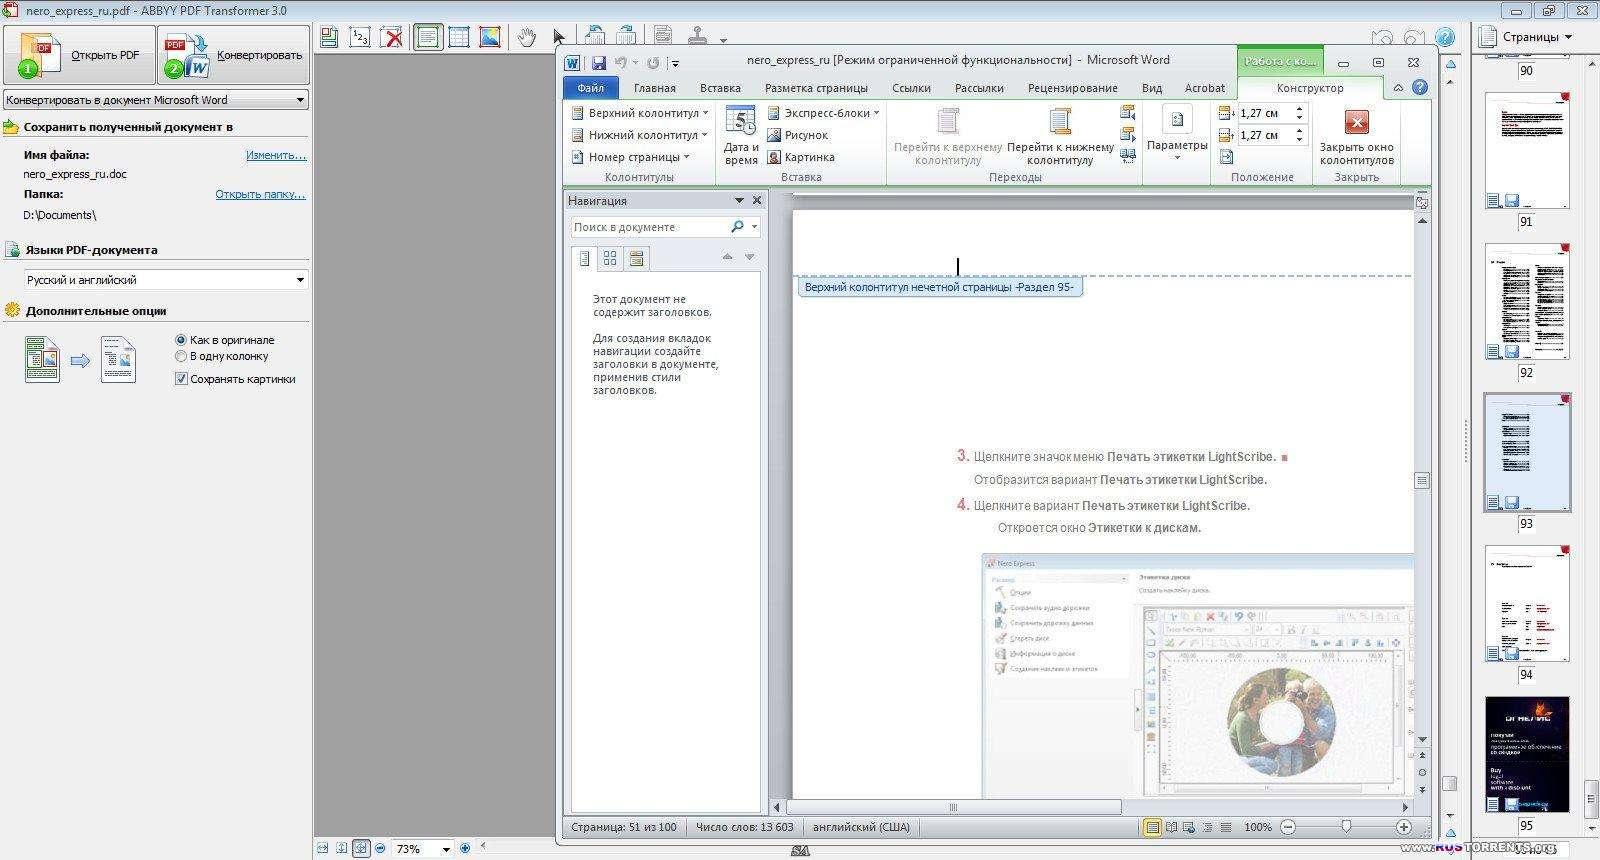 ABBYY PDF Transformer 3.0 build 9.0.102.46 | РС